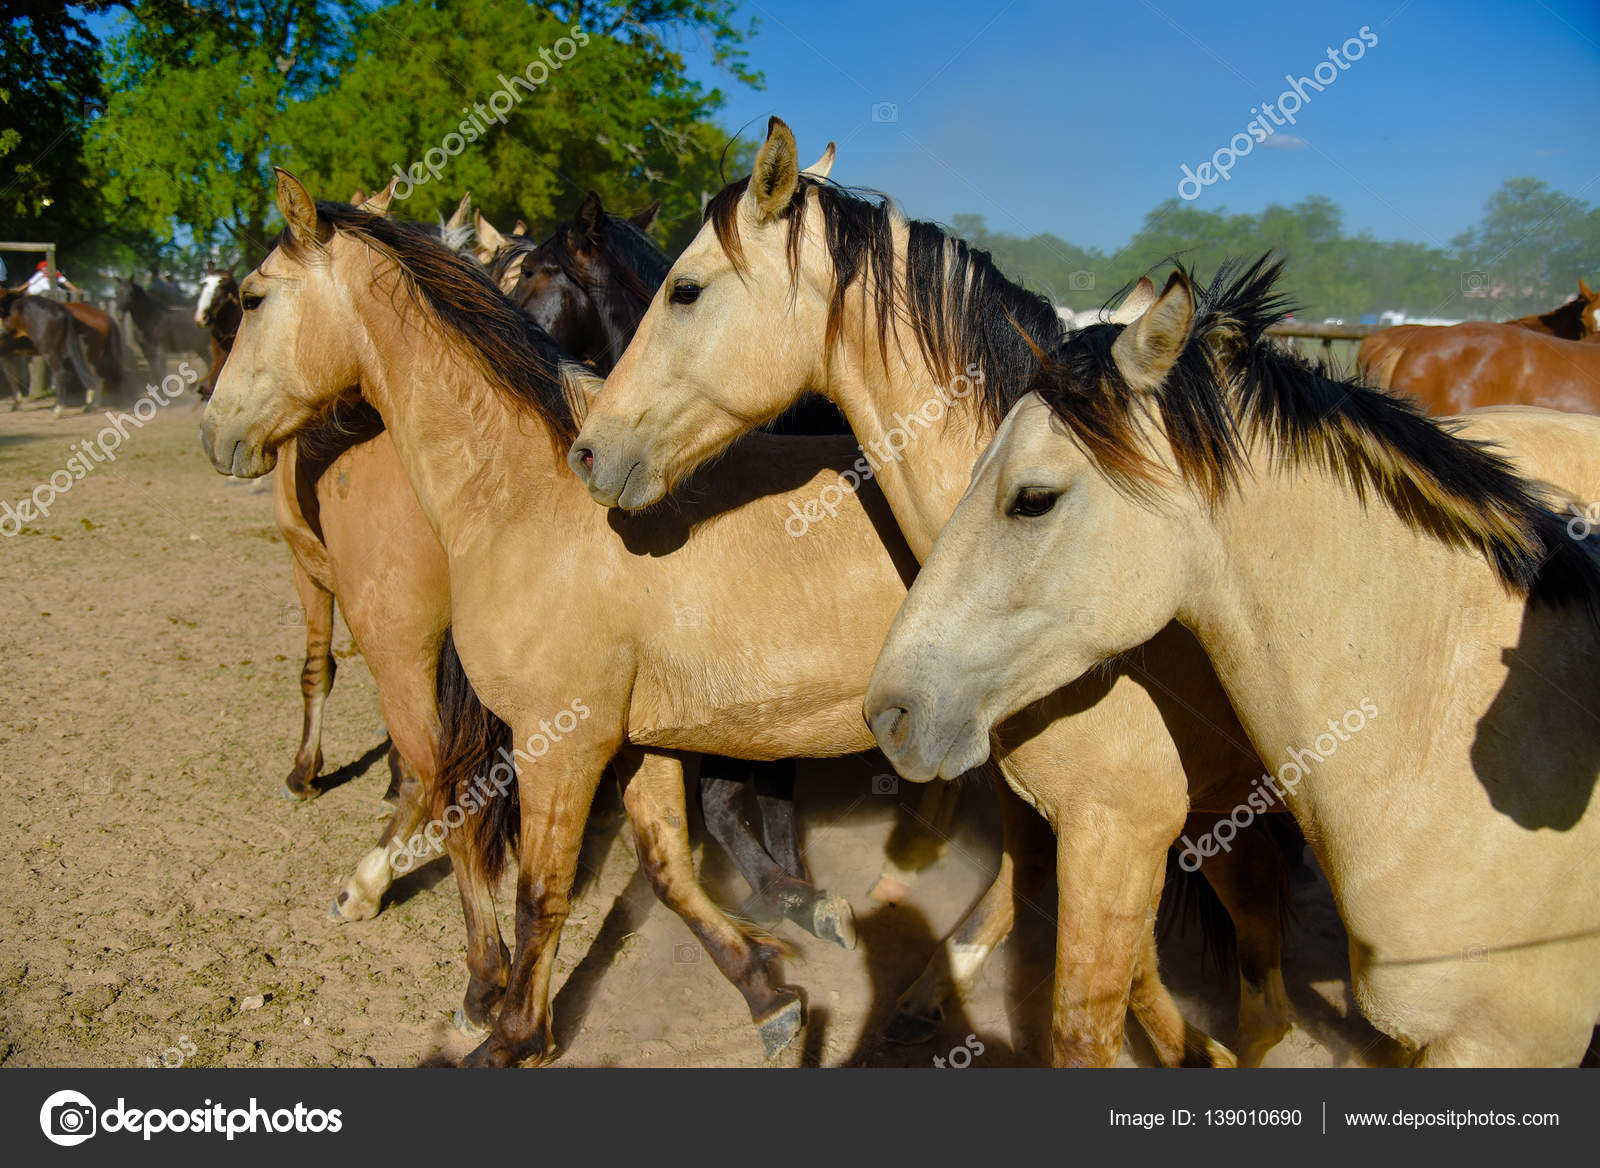 buckskin horses in a paddock stock photo anvmedia 139010690